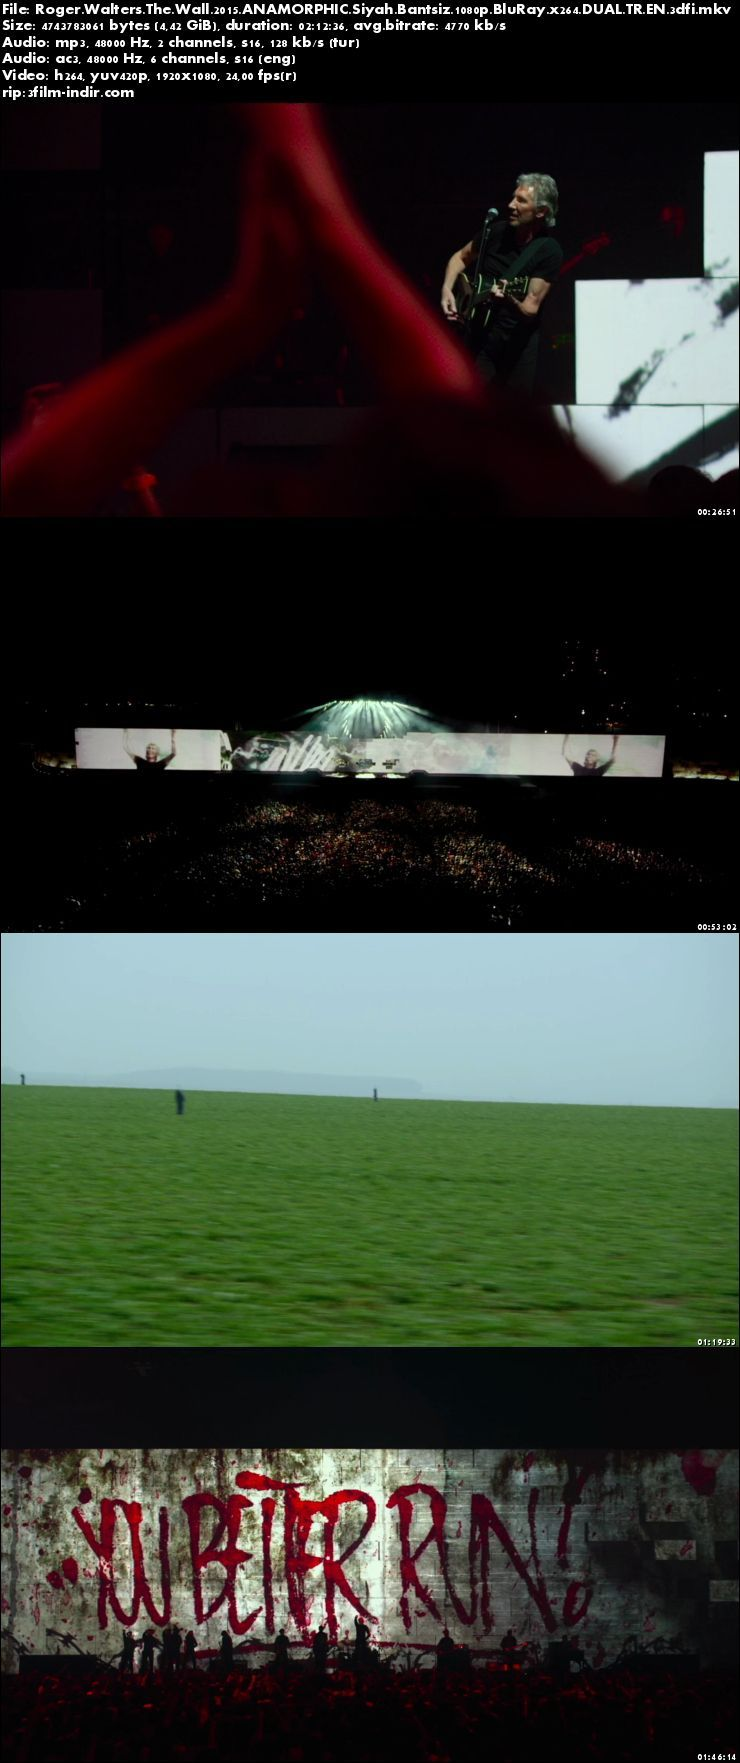 Roger Waters the Wall 2014 (ANAMORPHIC Siyah Bantsız BluRay m1080p) Türkçe Dublajlı full indir